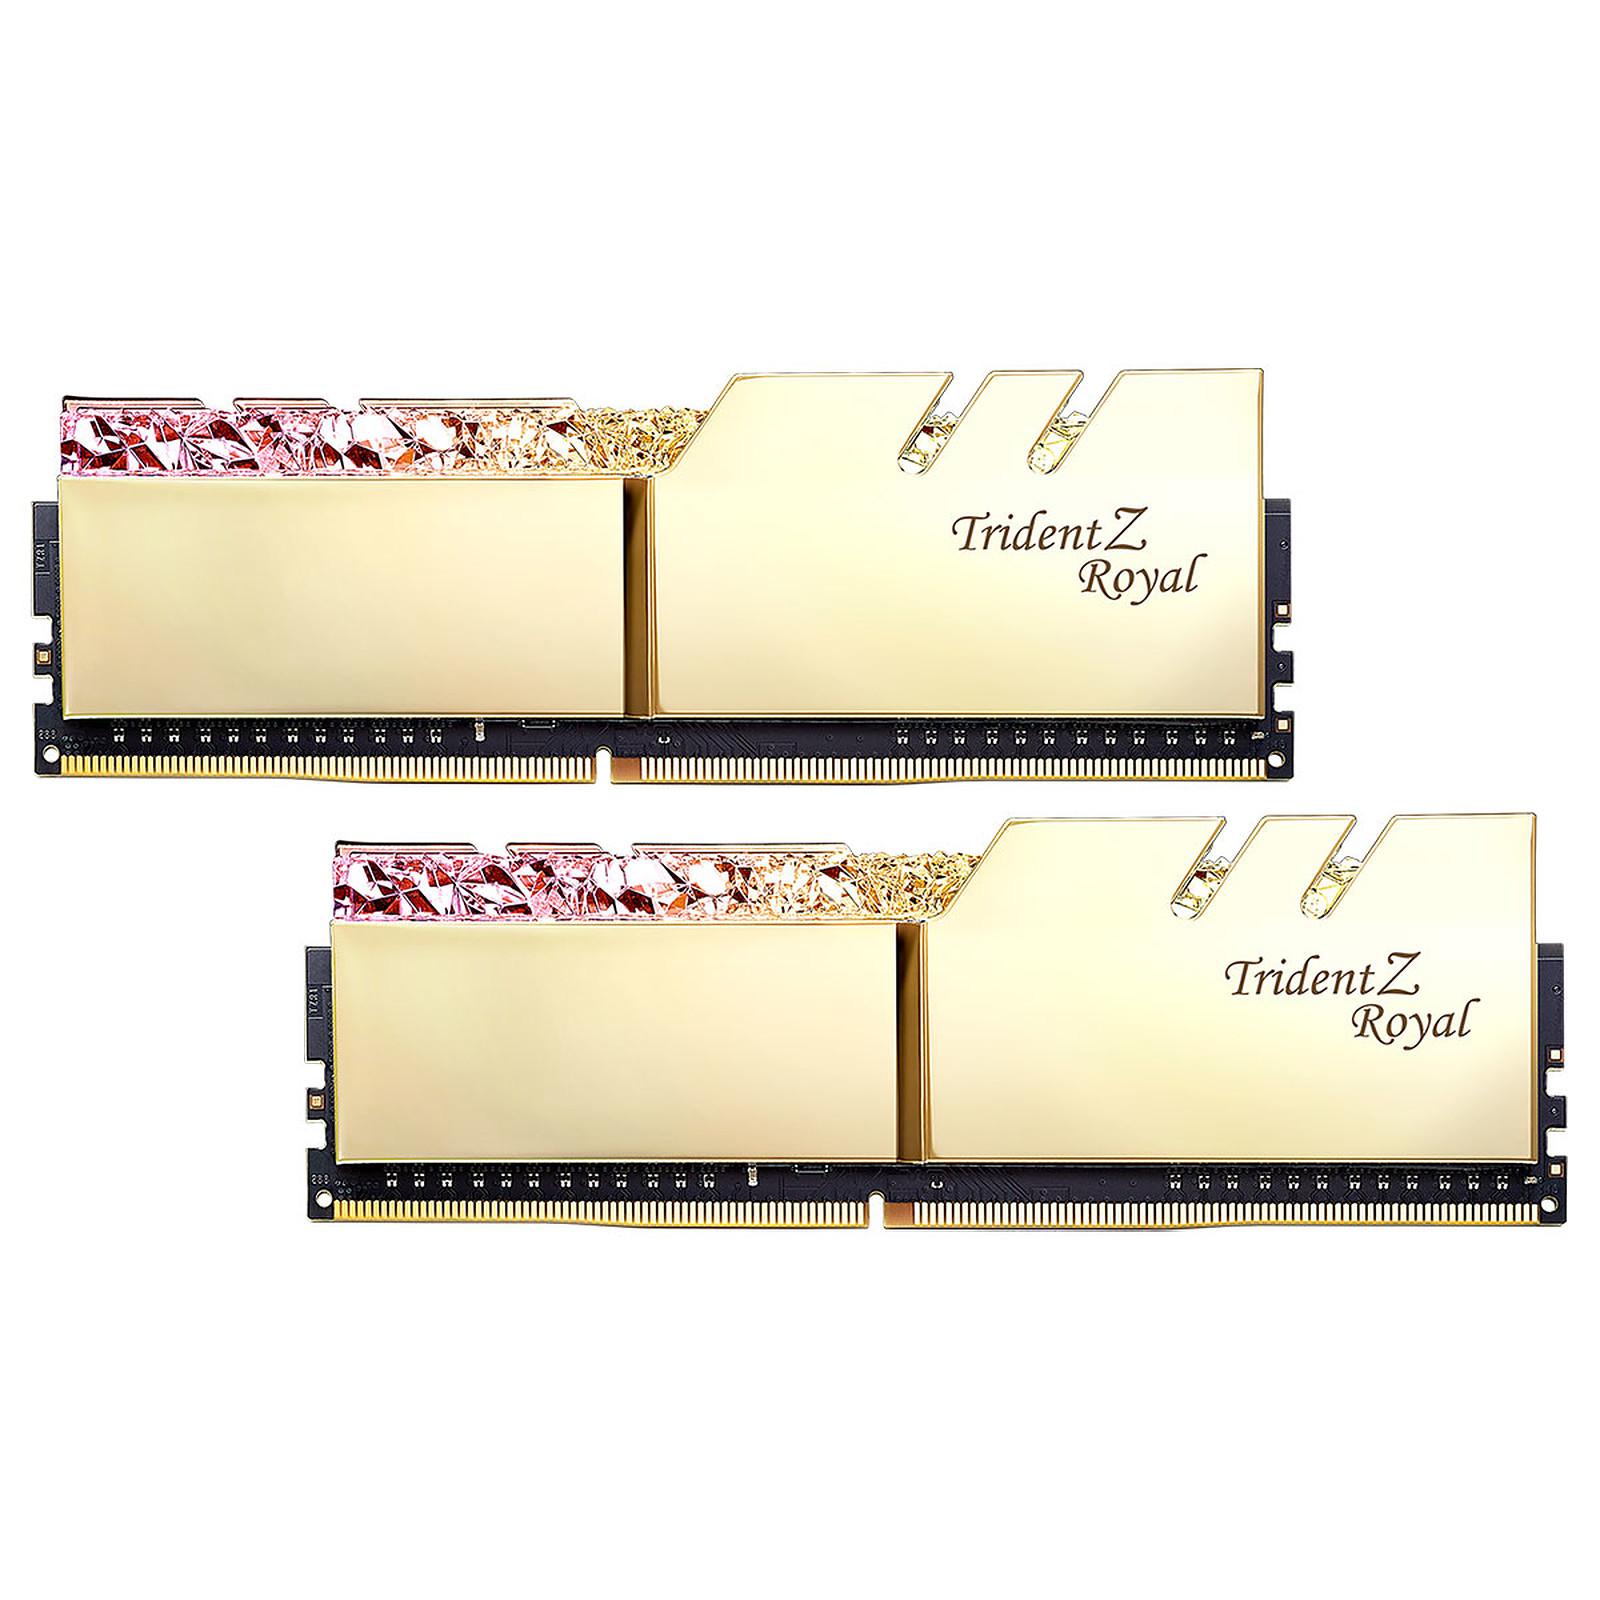 G.Skill Trident Z Royal 16 Go (2x 8 Go) DDR4 3600 MHz CL17 - Or